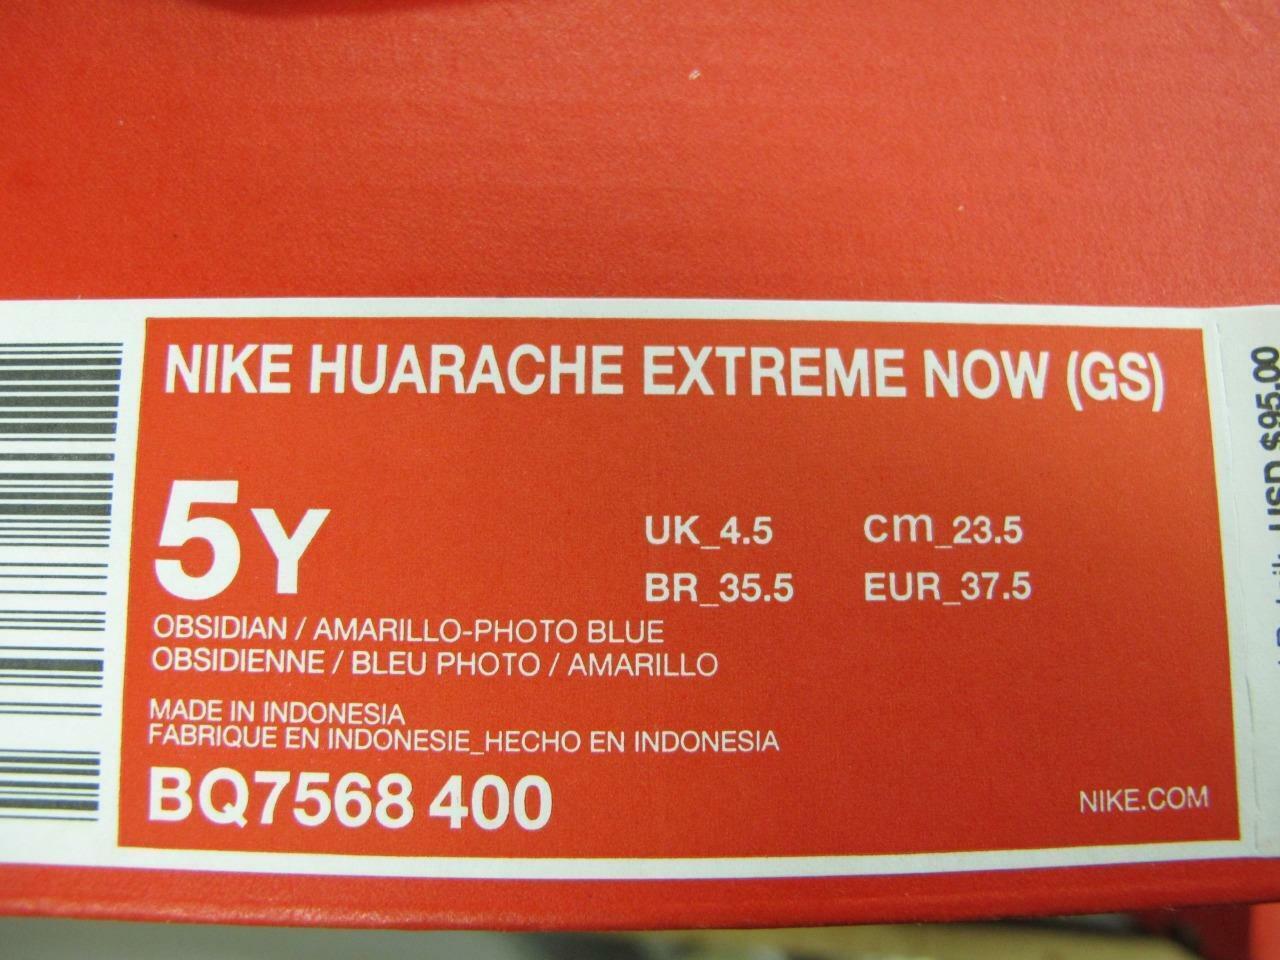 NEW JUNIORS NIKE HUARACHE HUARACHE HUARACHE EXTREME NOW BQ7568-400 3dafac